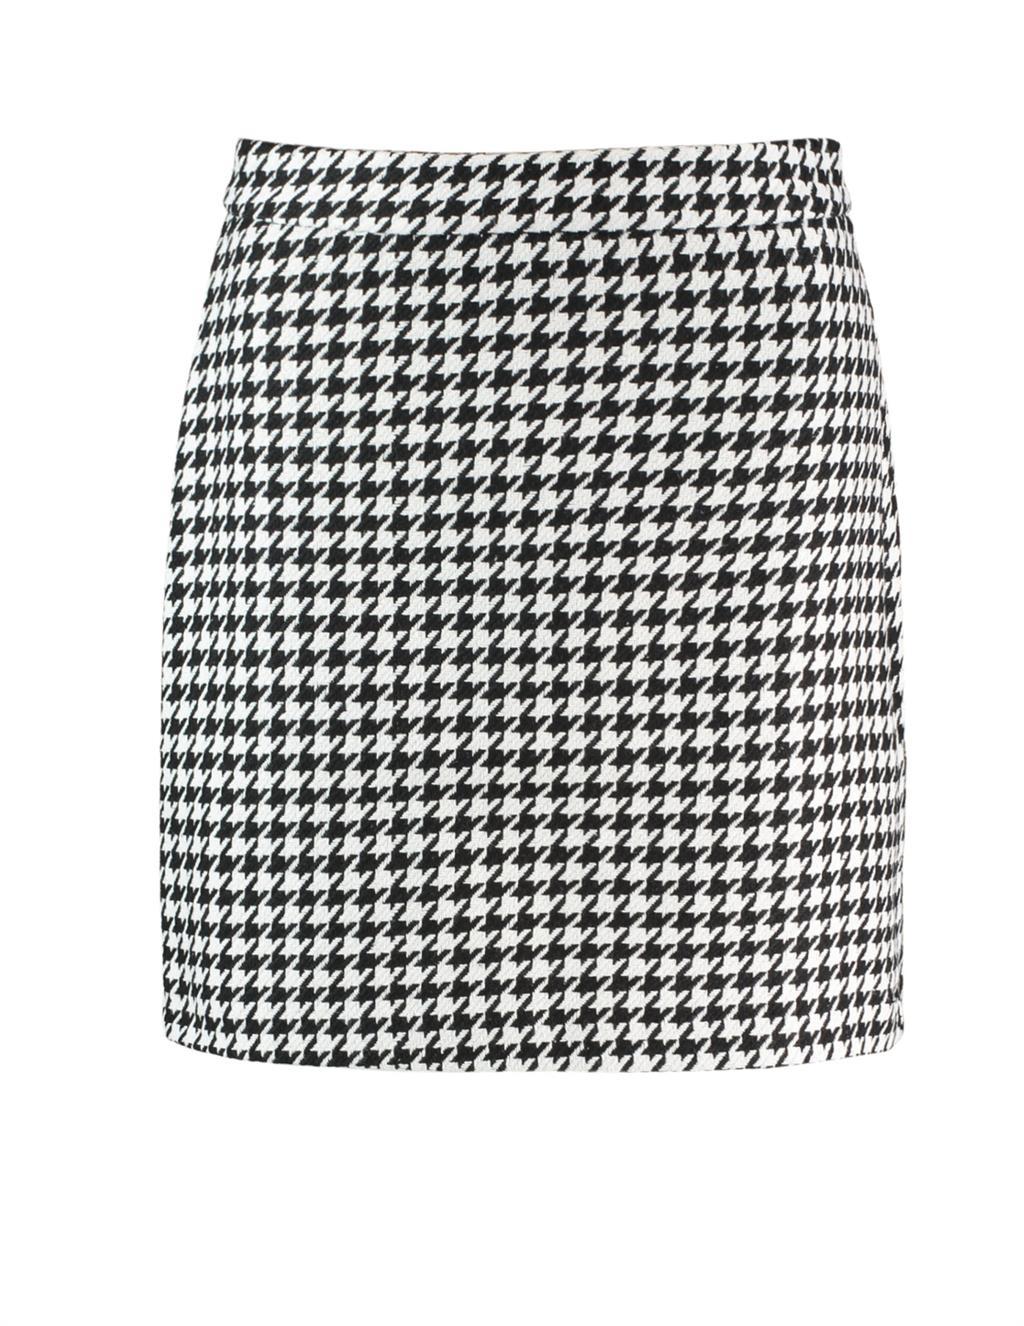 Witte dames Rok Na-kd - A-line Houndstooth Skirt black/white